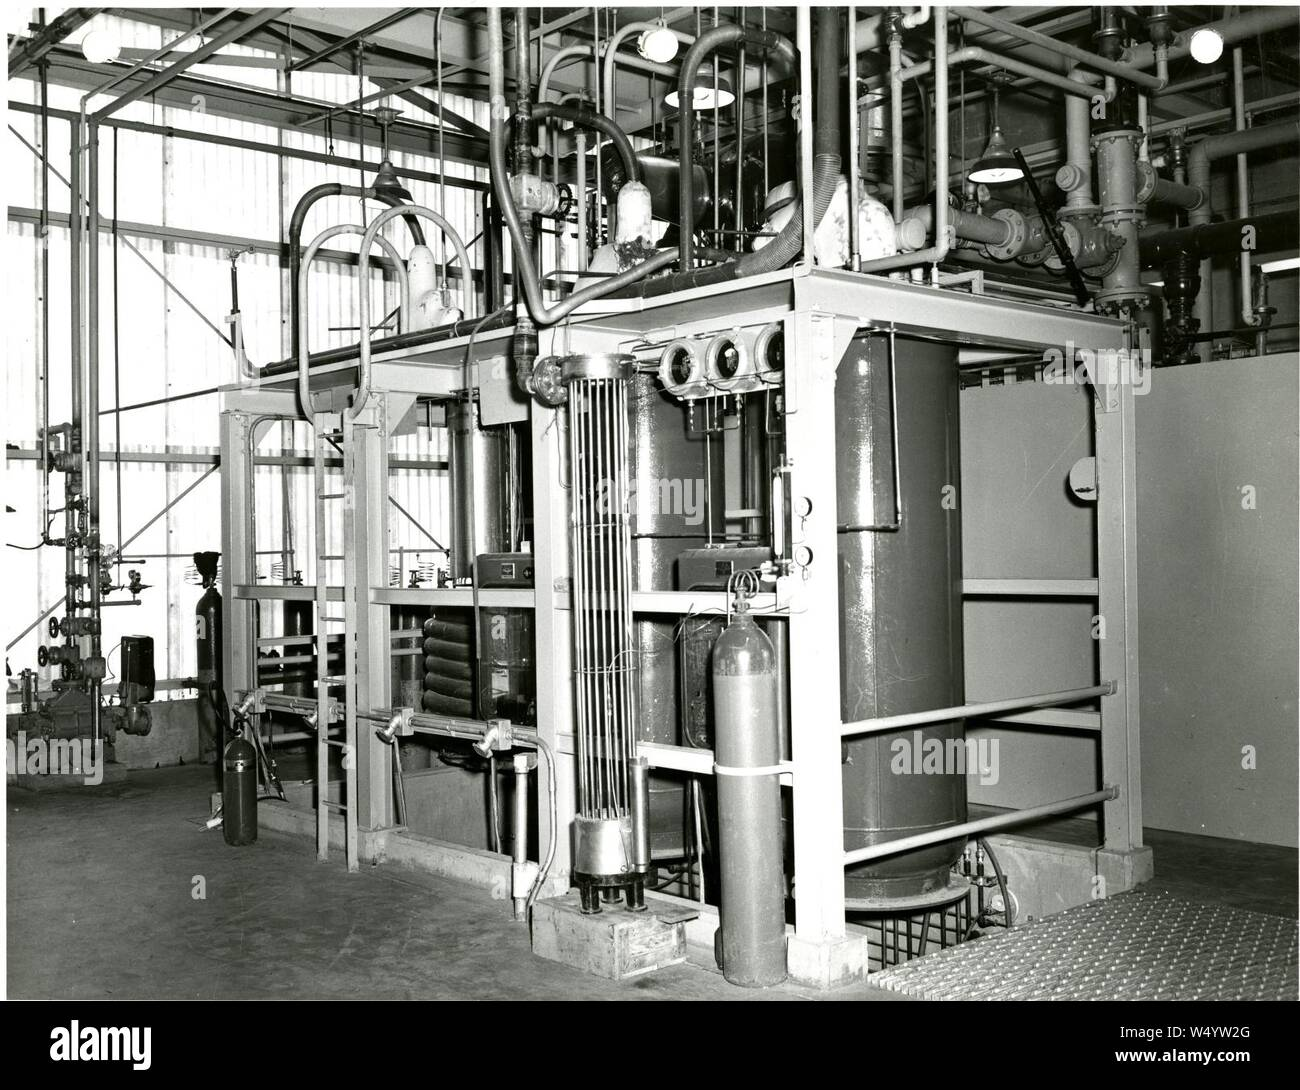 Cryogenics 018. Stock Photo